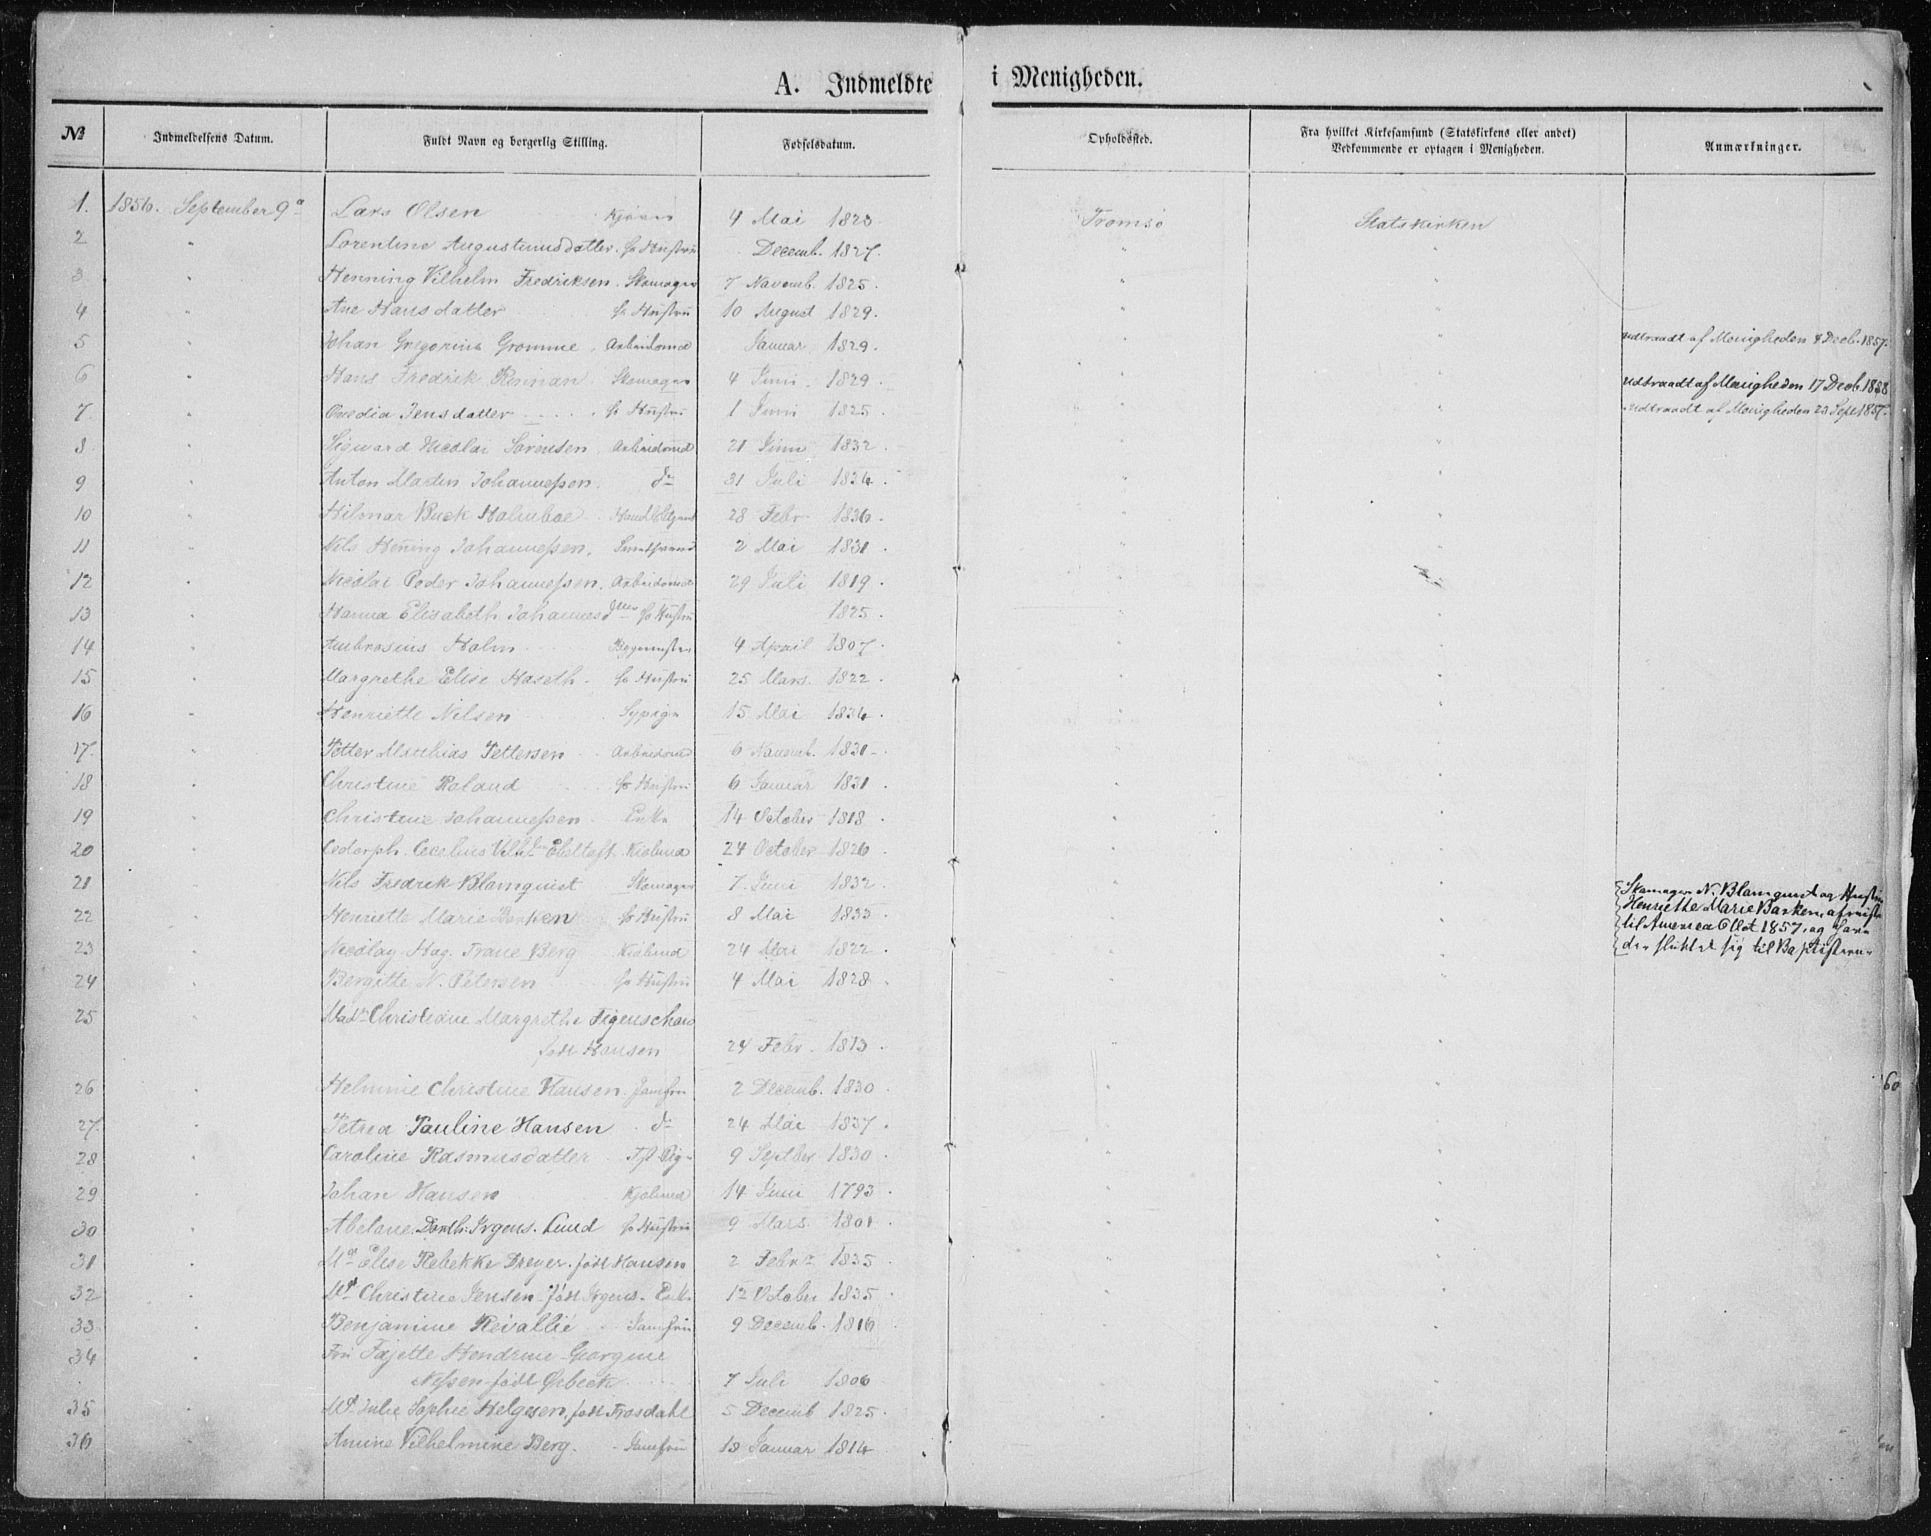 SATØ, Uten arkivreferanse, Dissenter register no. DP 1, 1856-1892